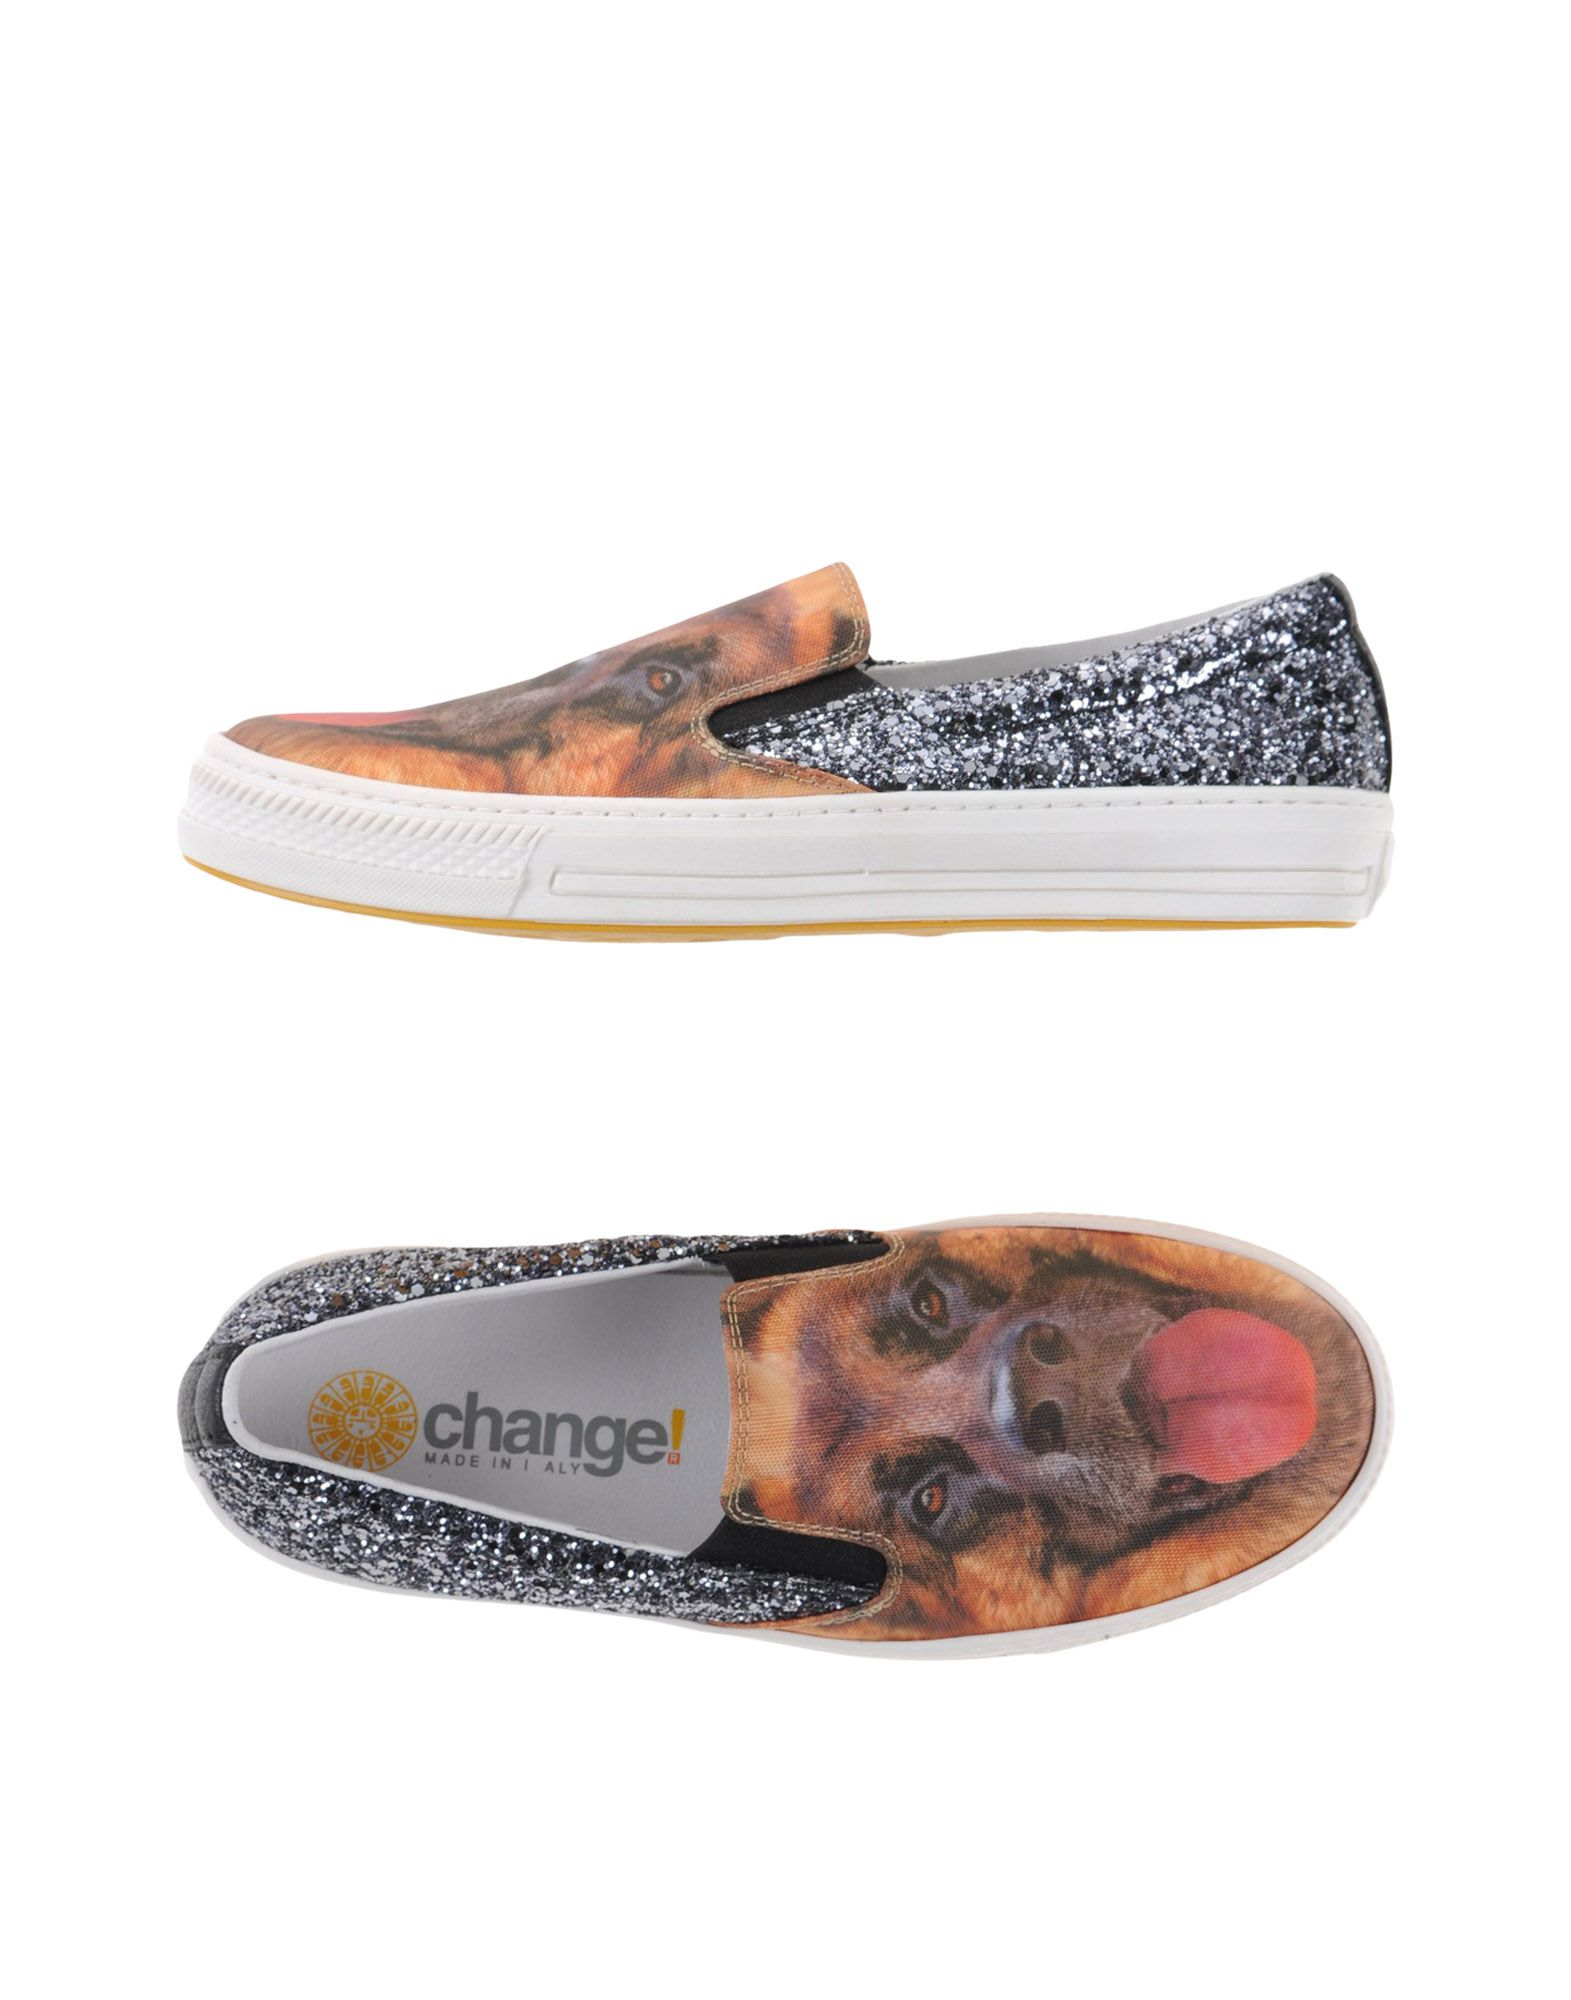 ENRICO FANTINI CHANGE! Низкие кеды и кроссовки enrico fantini низкие кеды и кроссовки